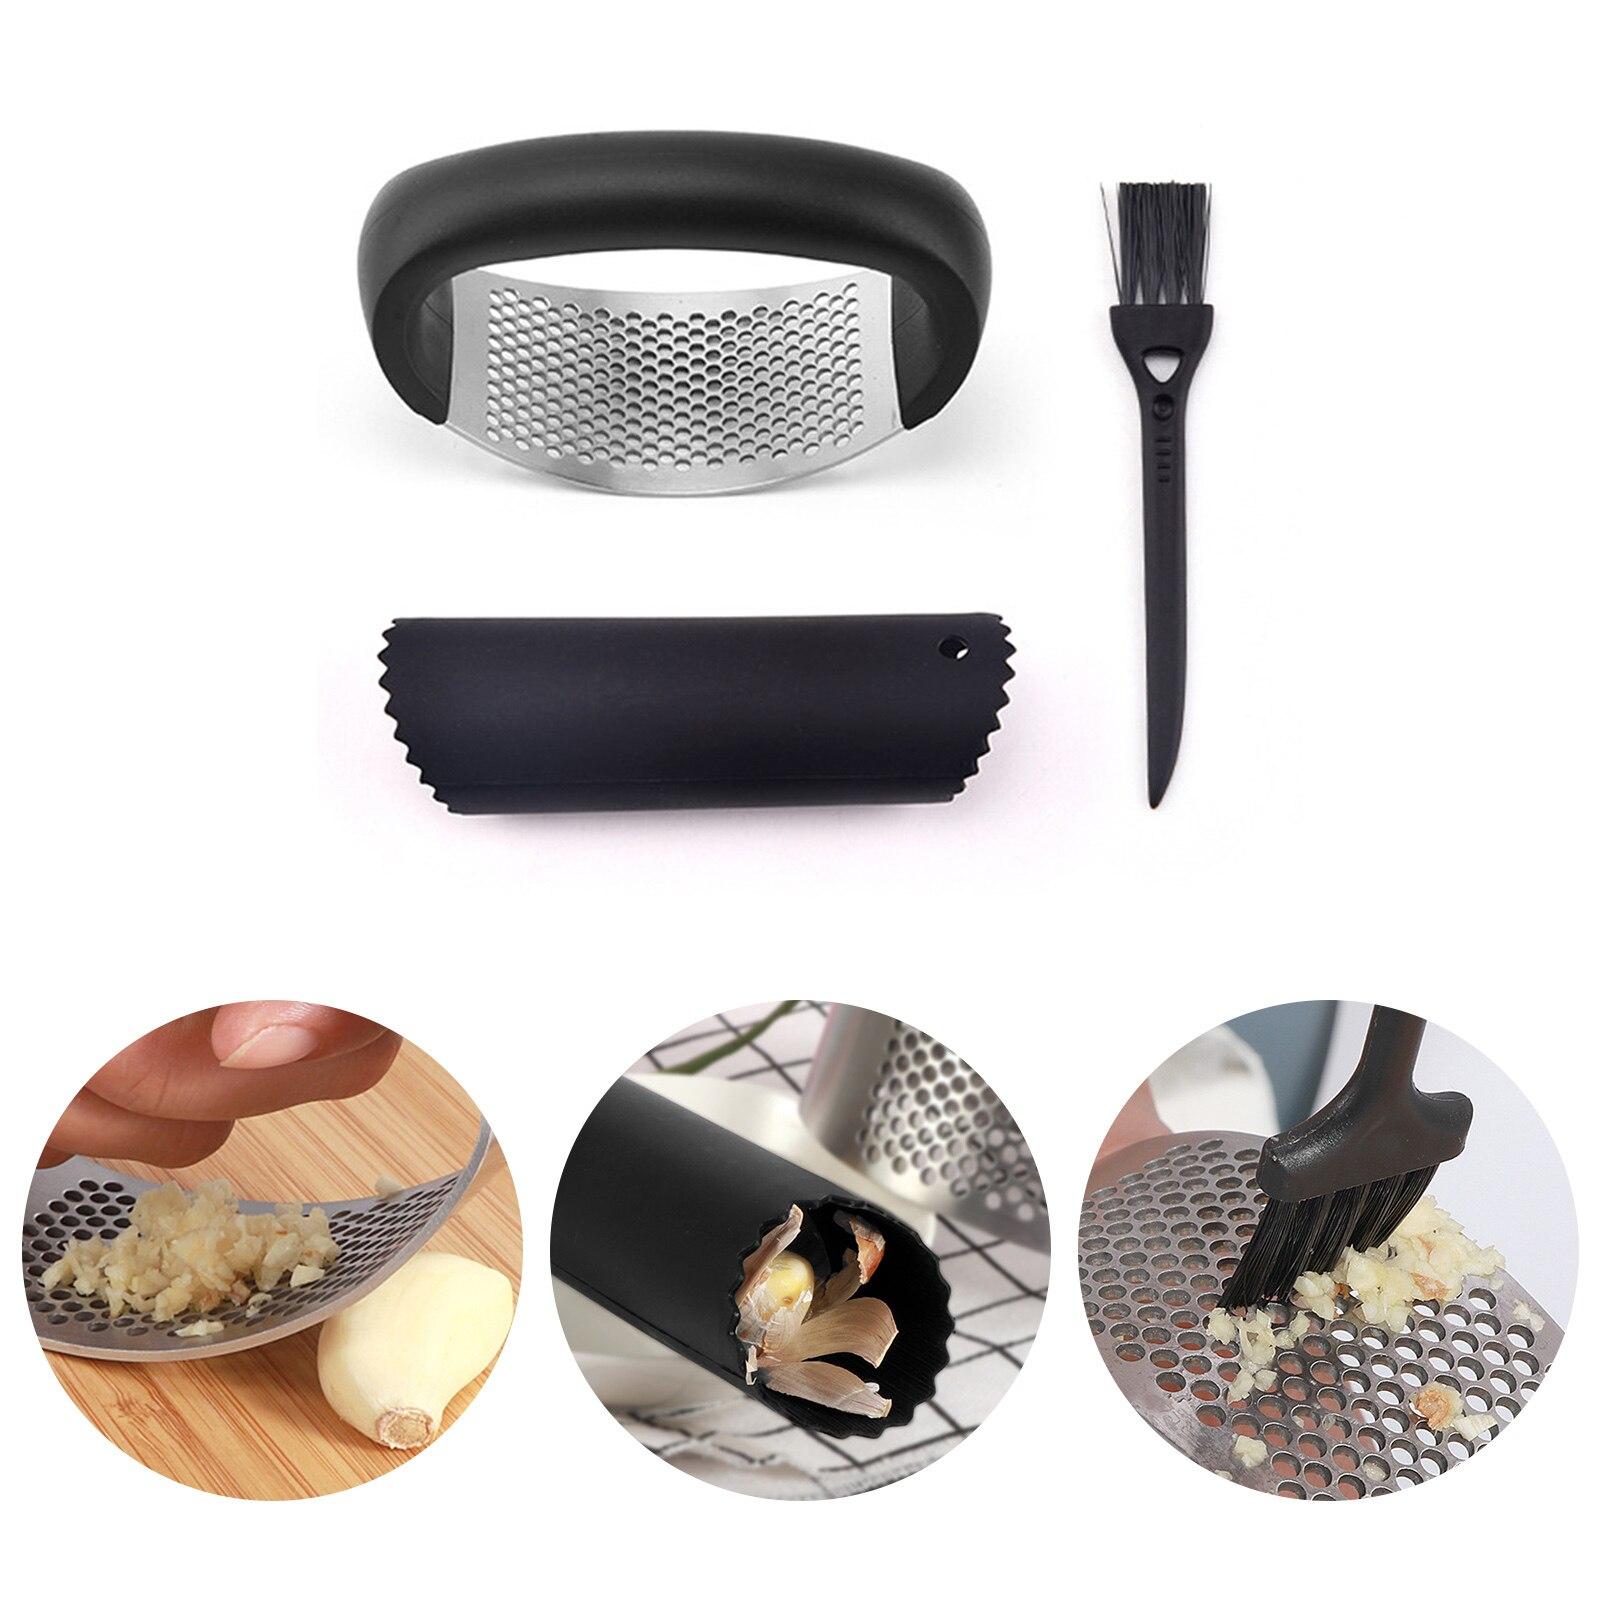 Garlic Presser Rocker Roller Set Ergonomic Handle Stainless Steel Garlic Mincer Crusher 3 Pieces Gadget Kit For Kitchen Cooking